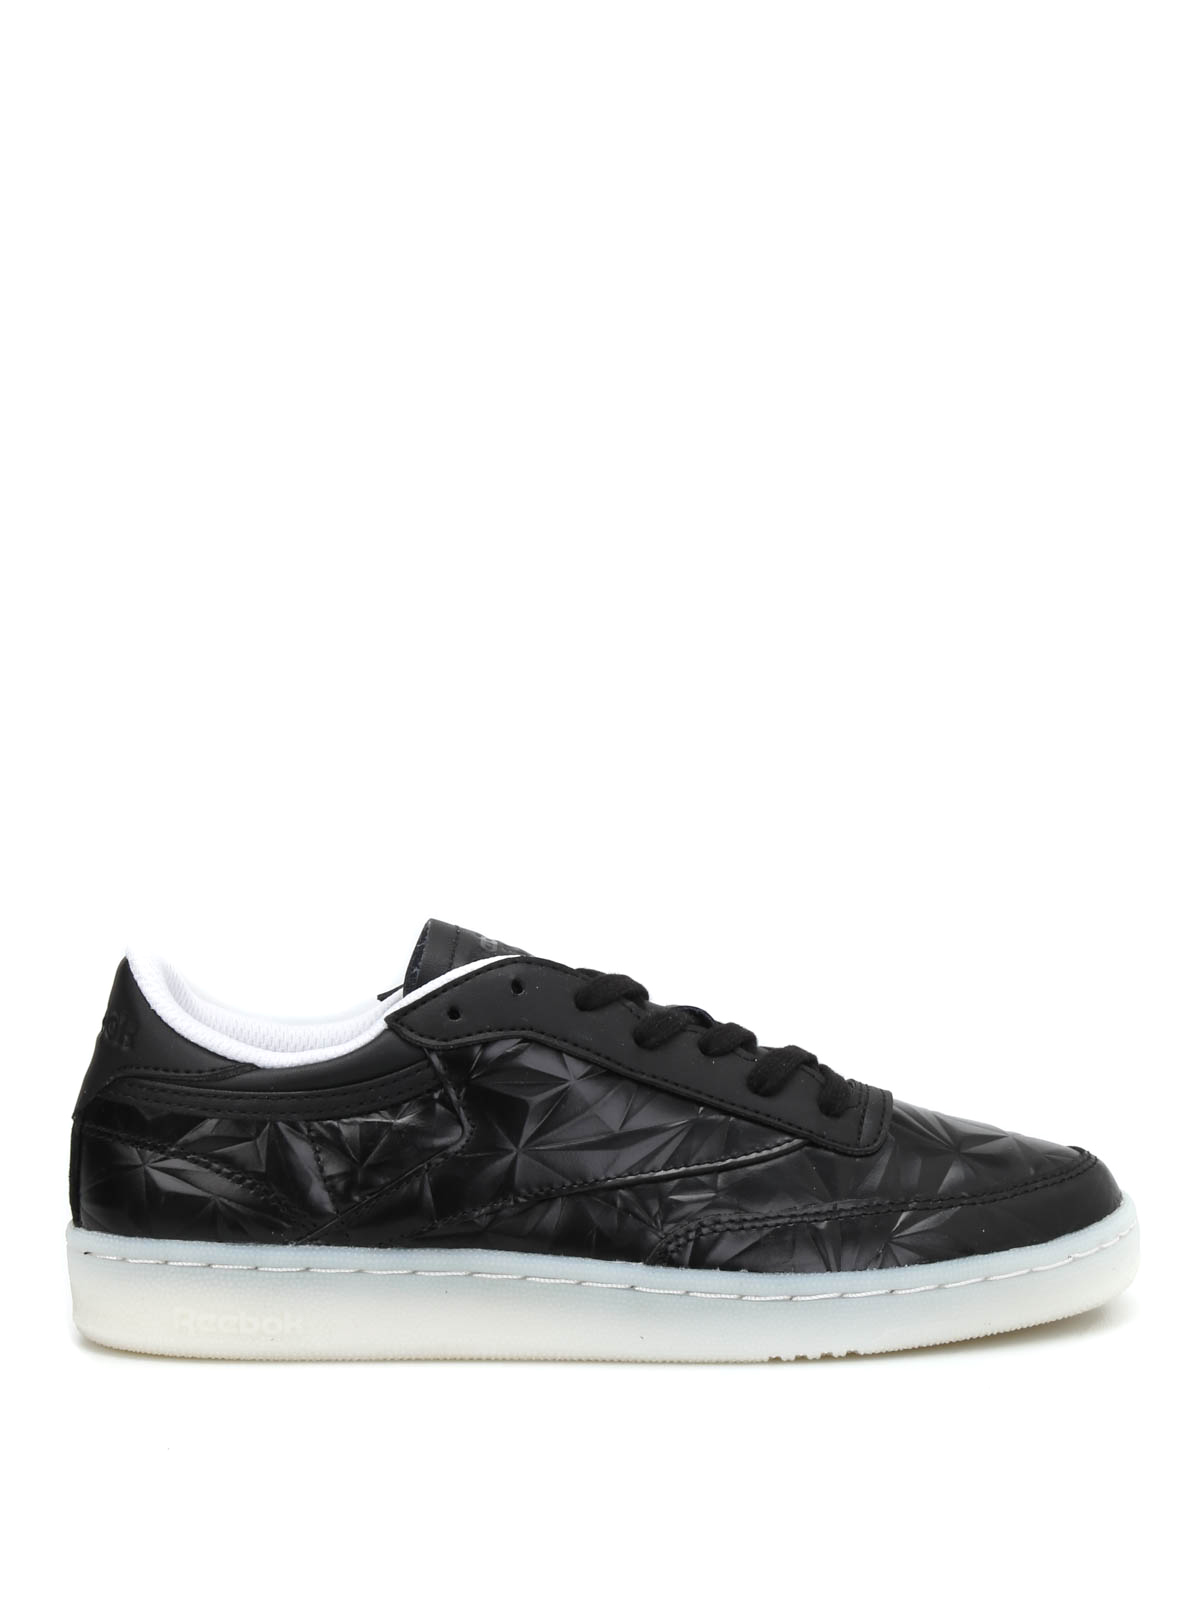 Reebok - Club C 85 Hype leather